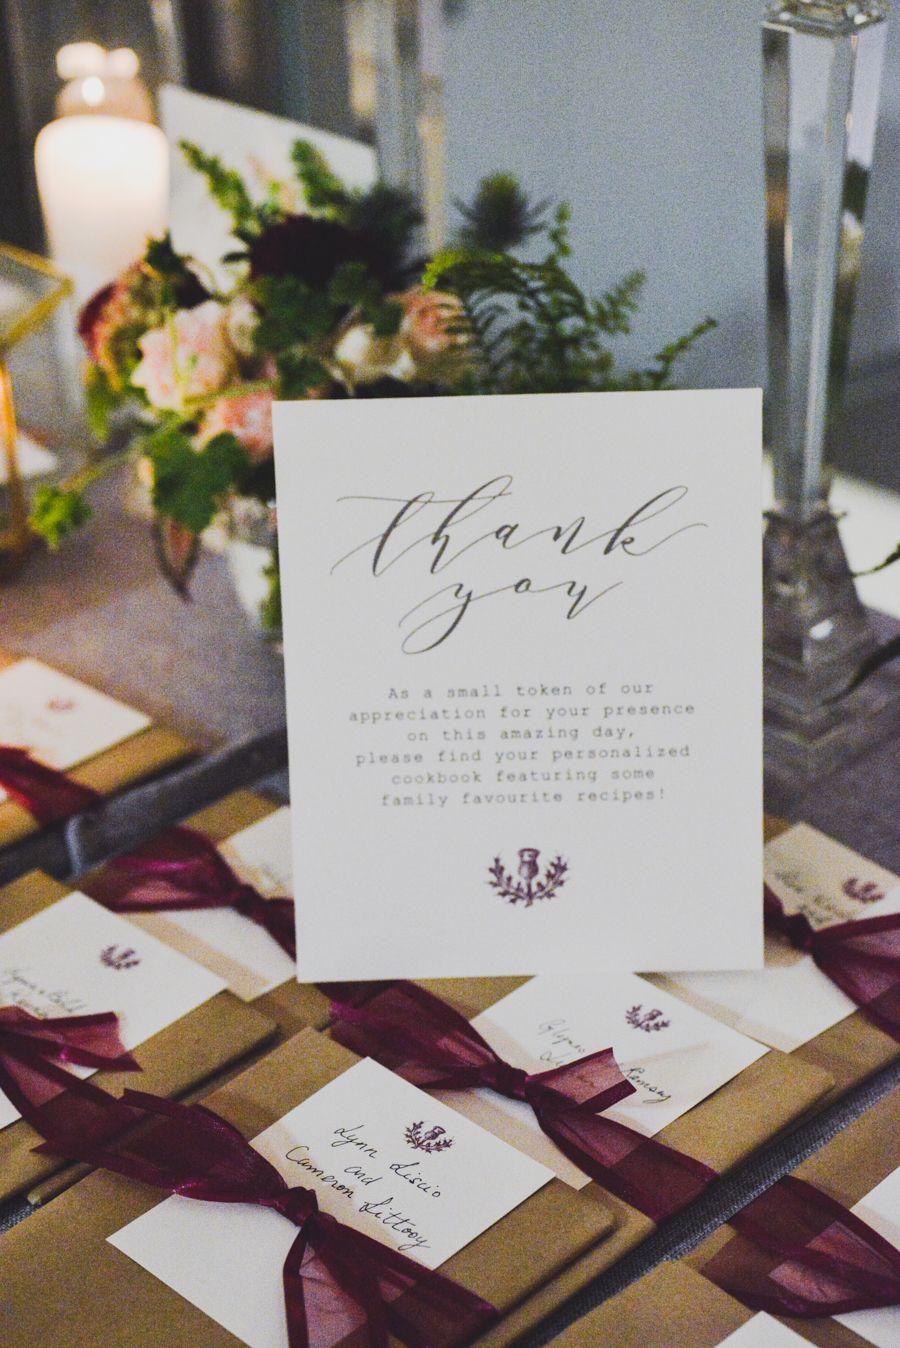 Handcrafted Cookbook Wedding Favors   Wedding   Pinterest   Favors ...